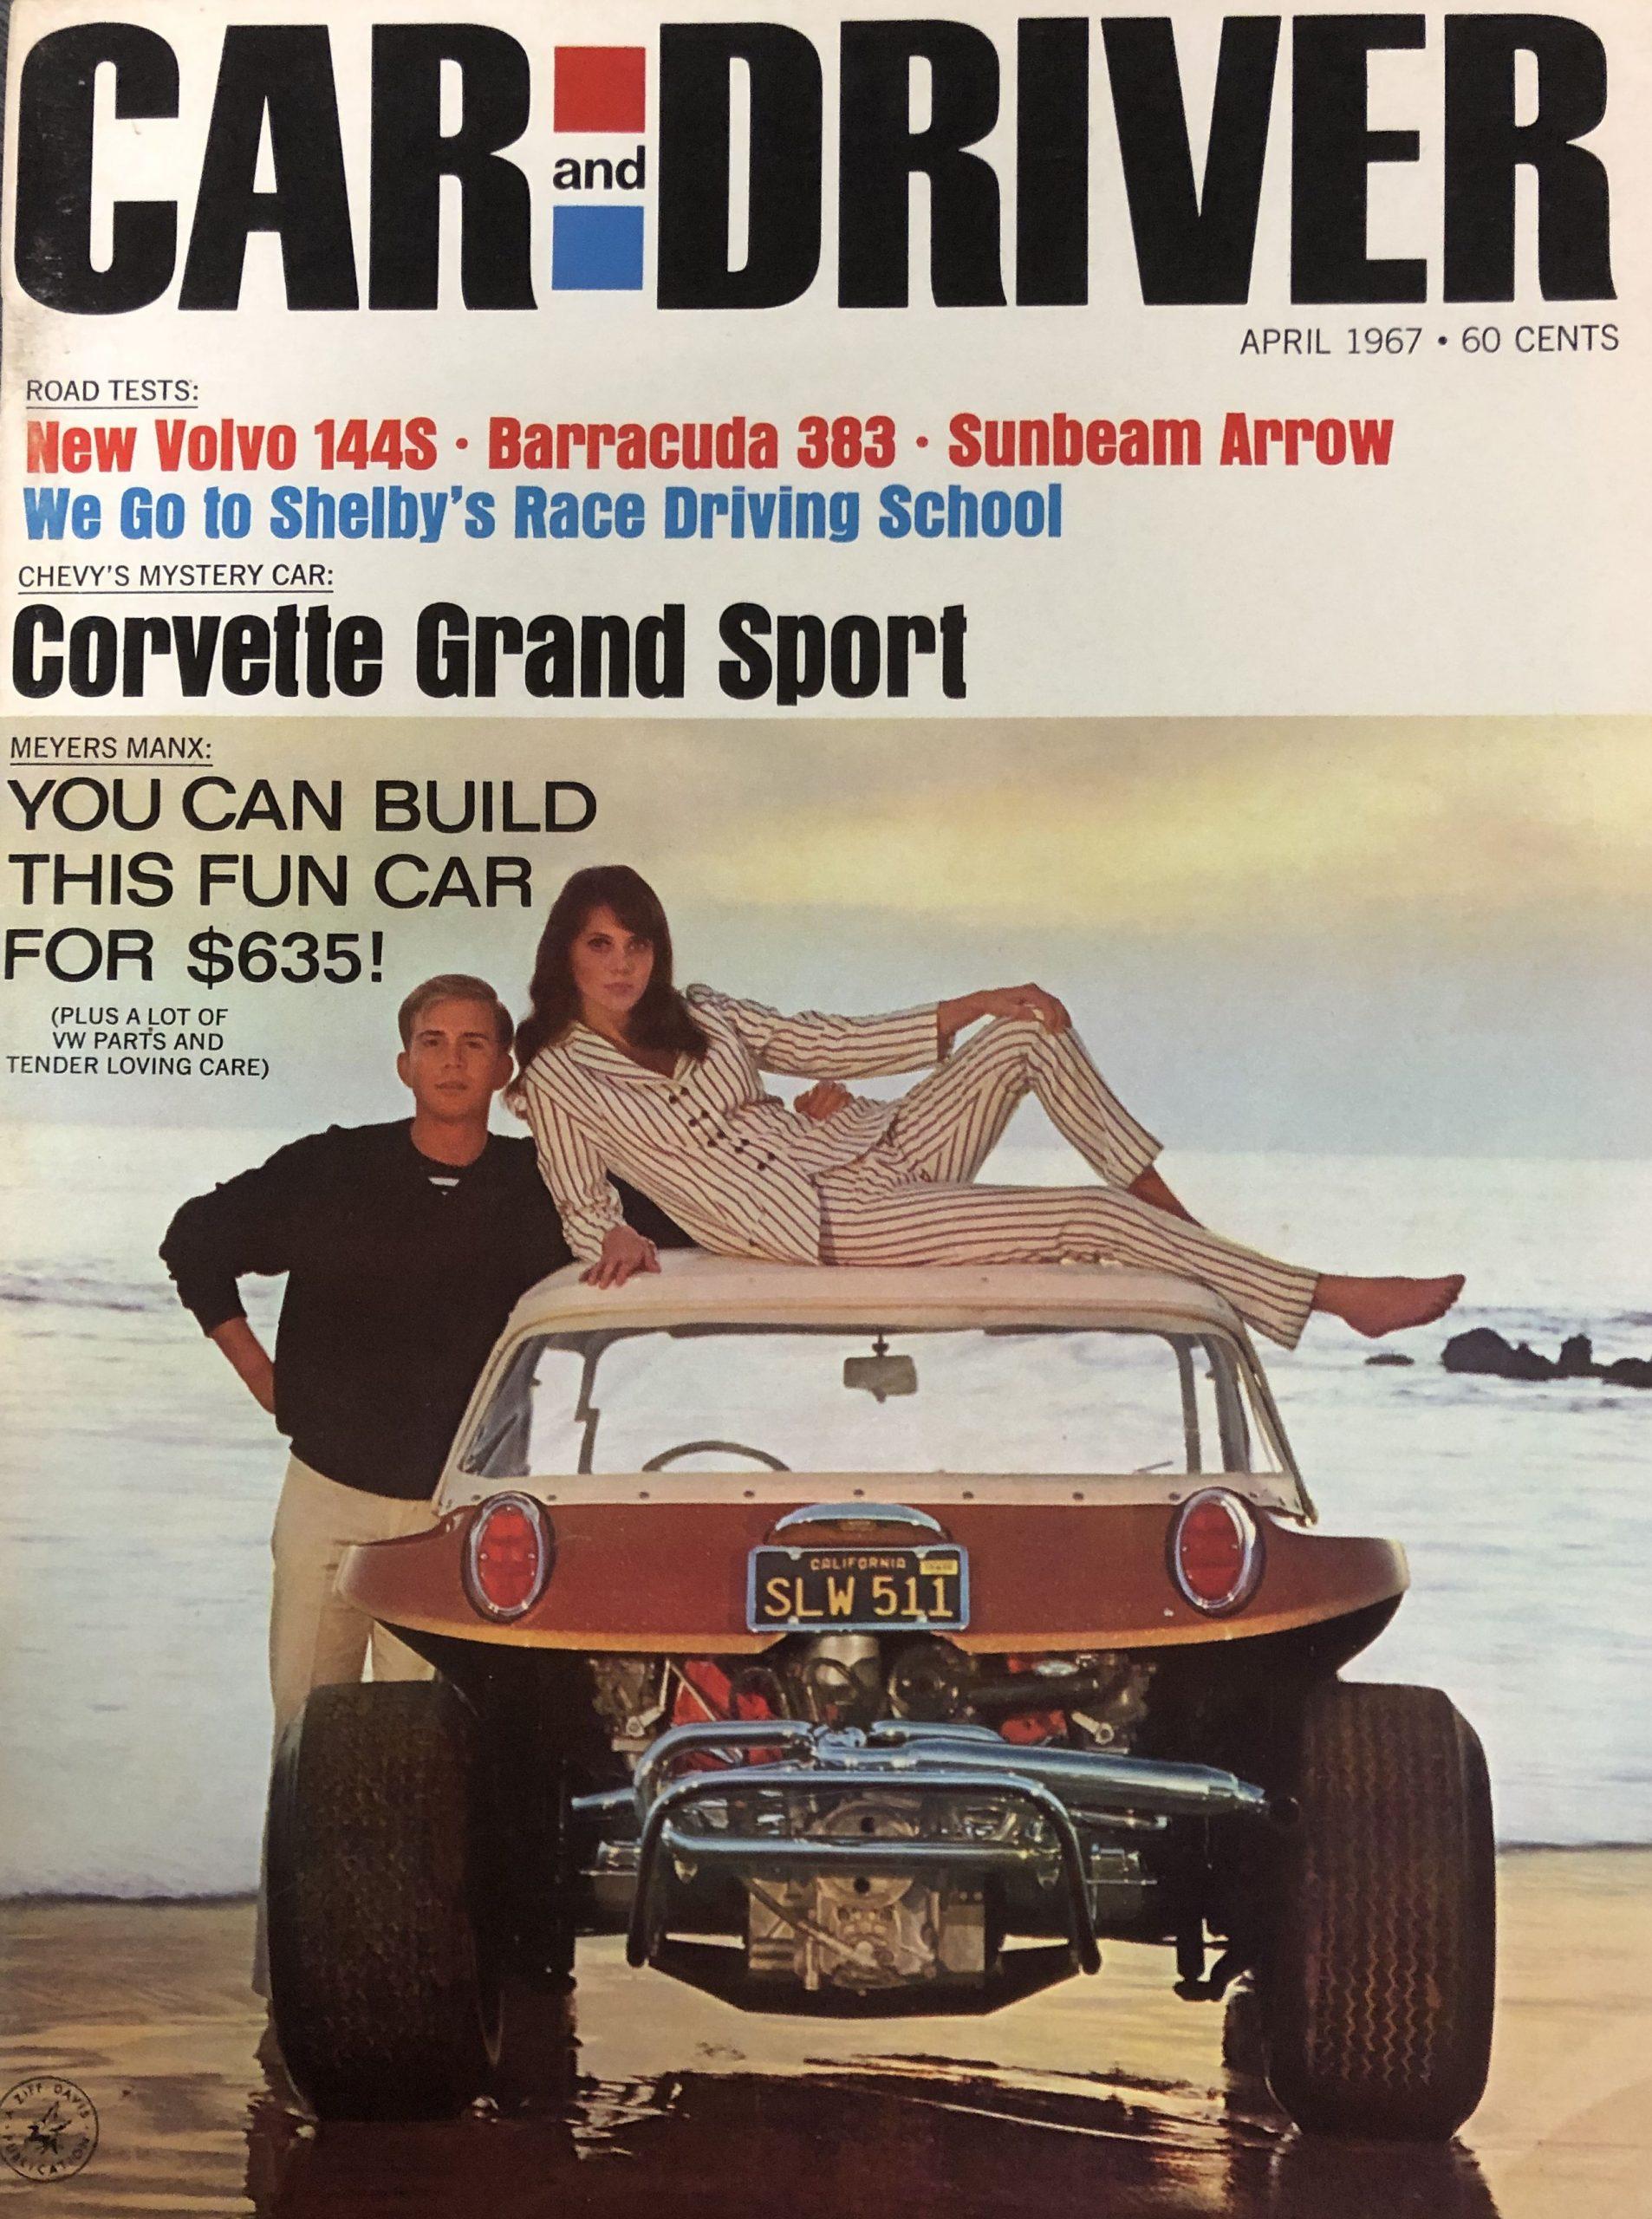 Meyers Manx Fiberglass Dune Buggy Car and Driver Magazine Cover